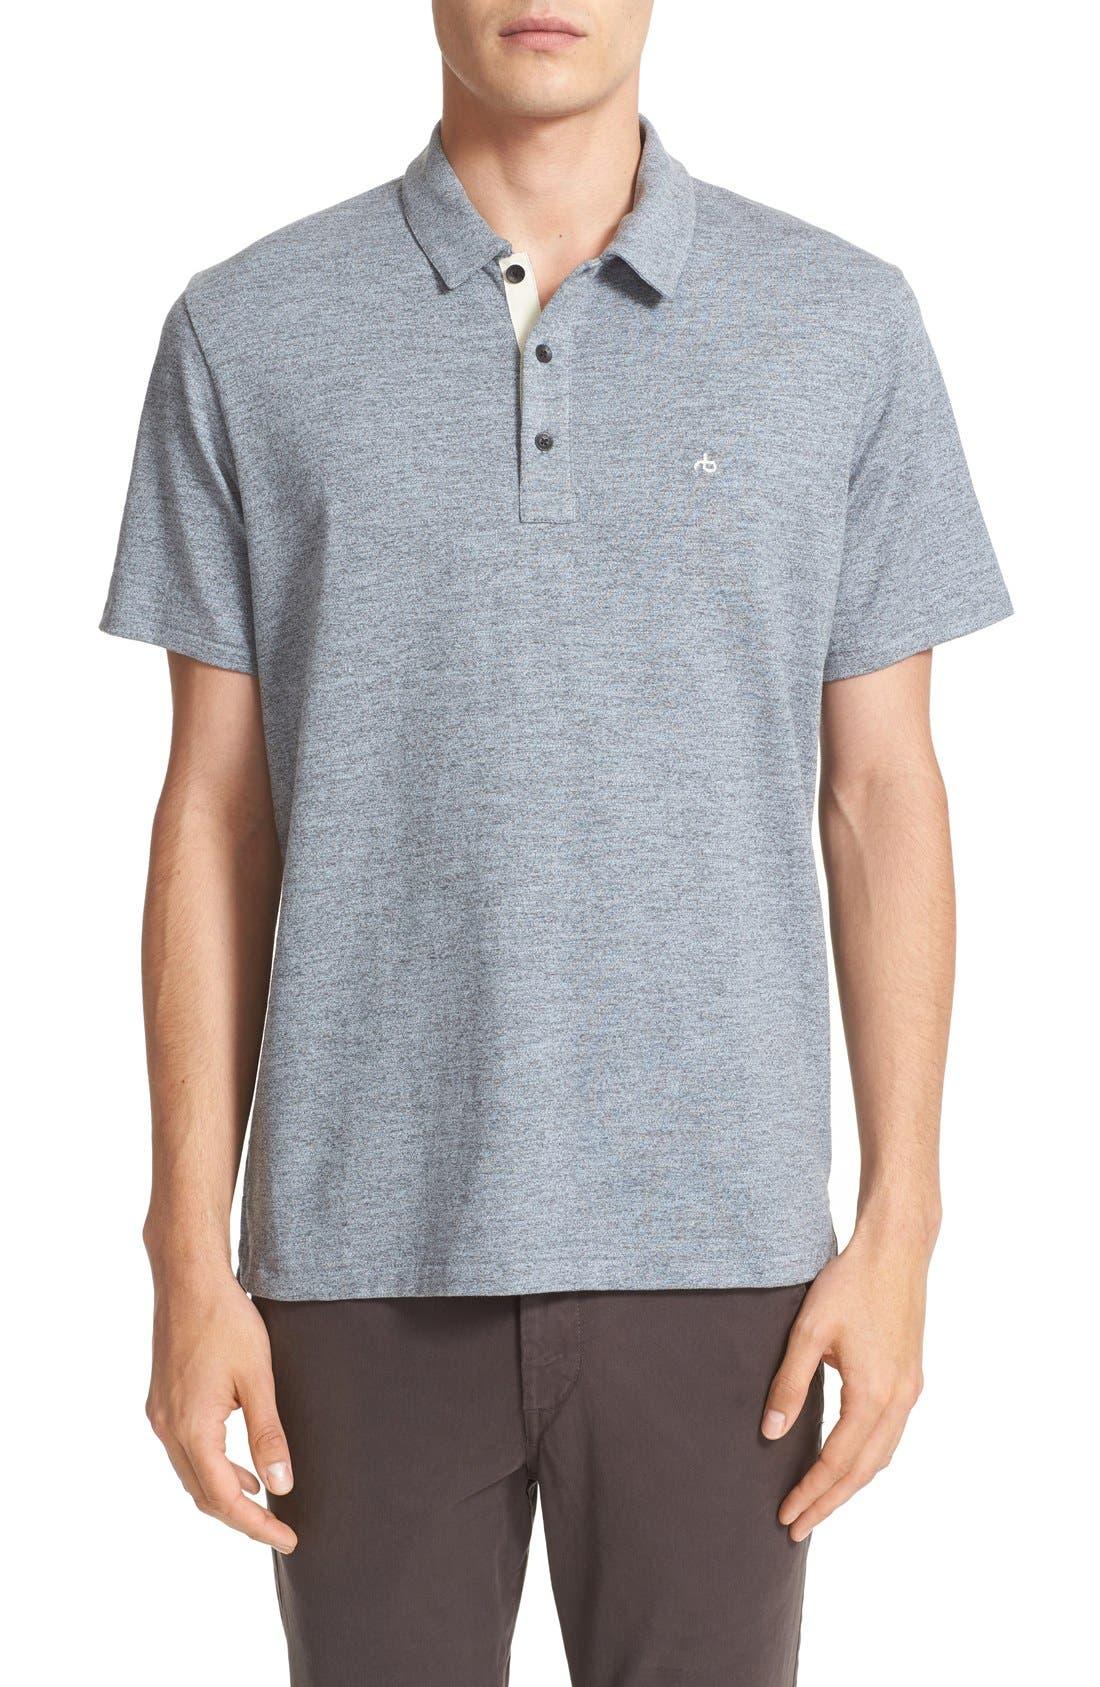 Alternate Image 1 Selected - rag & bone Standard Issue Regular Fit Slub Cotton Polo